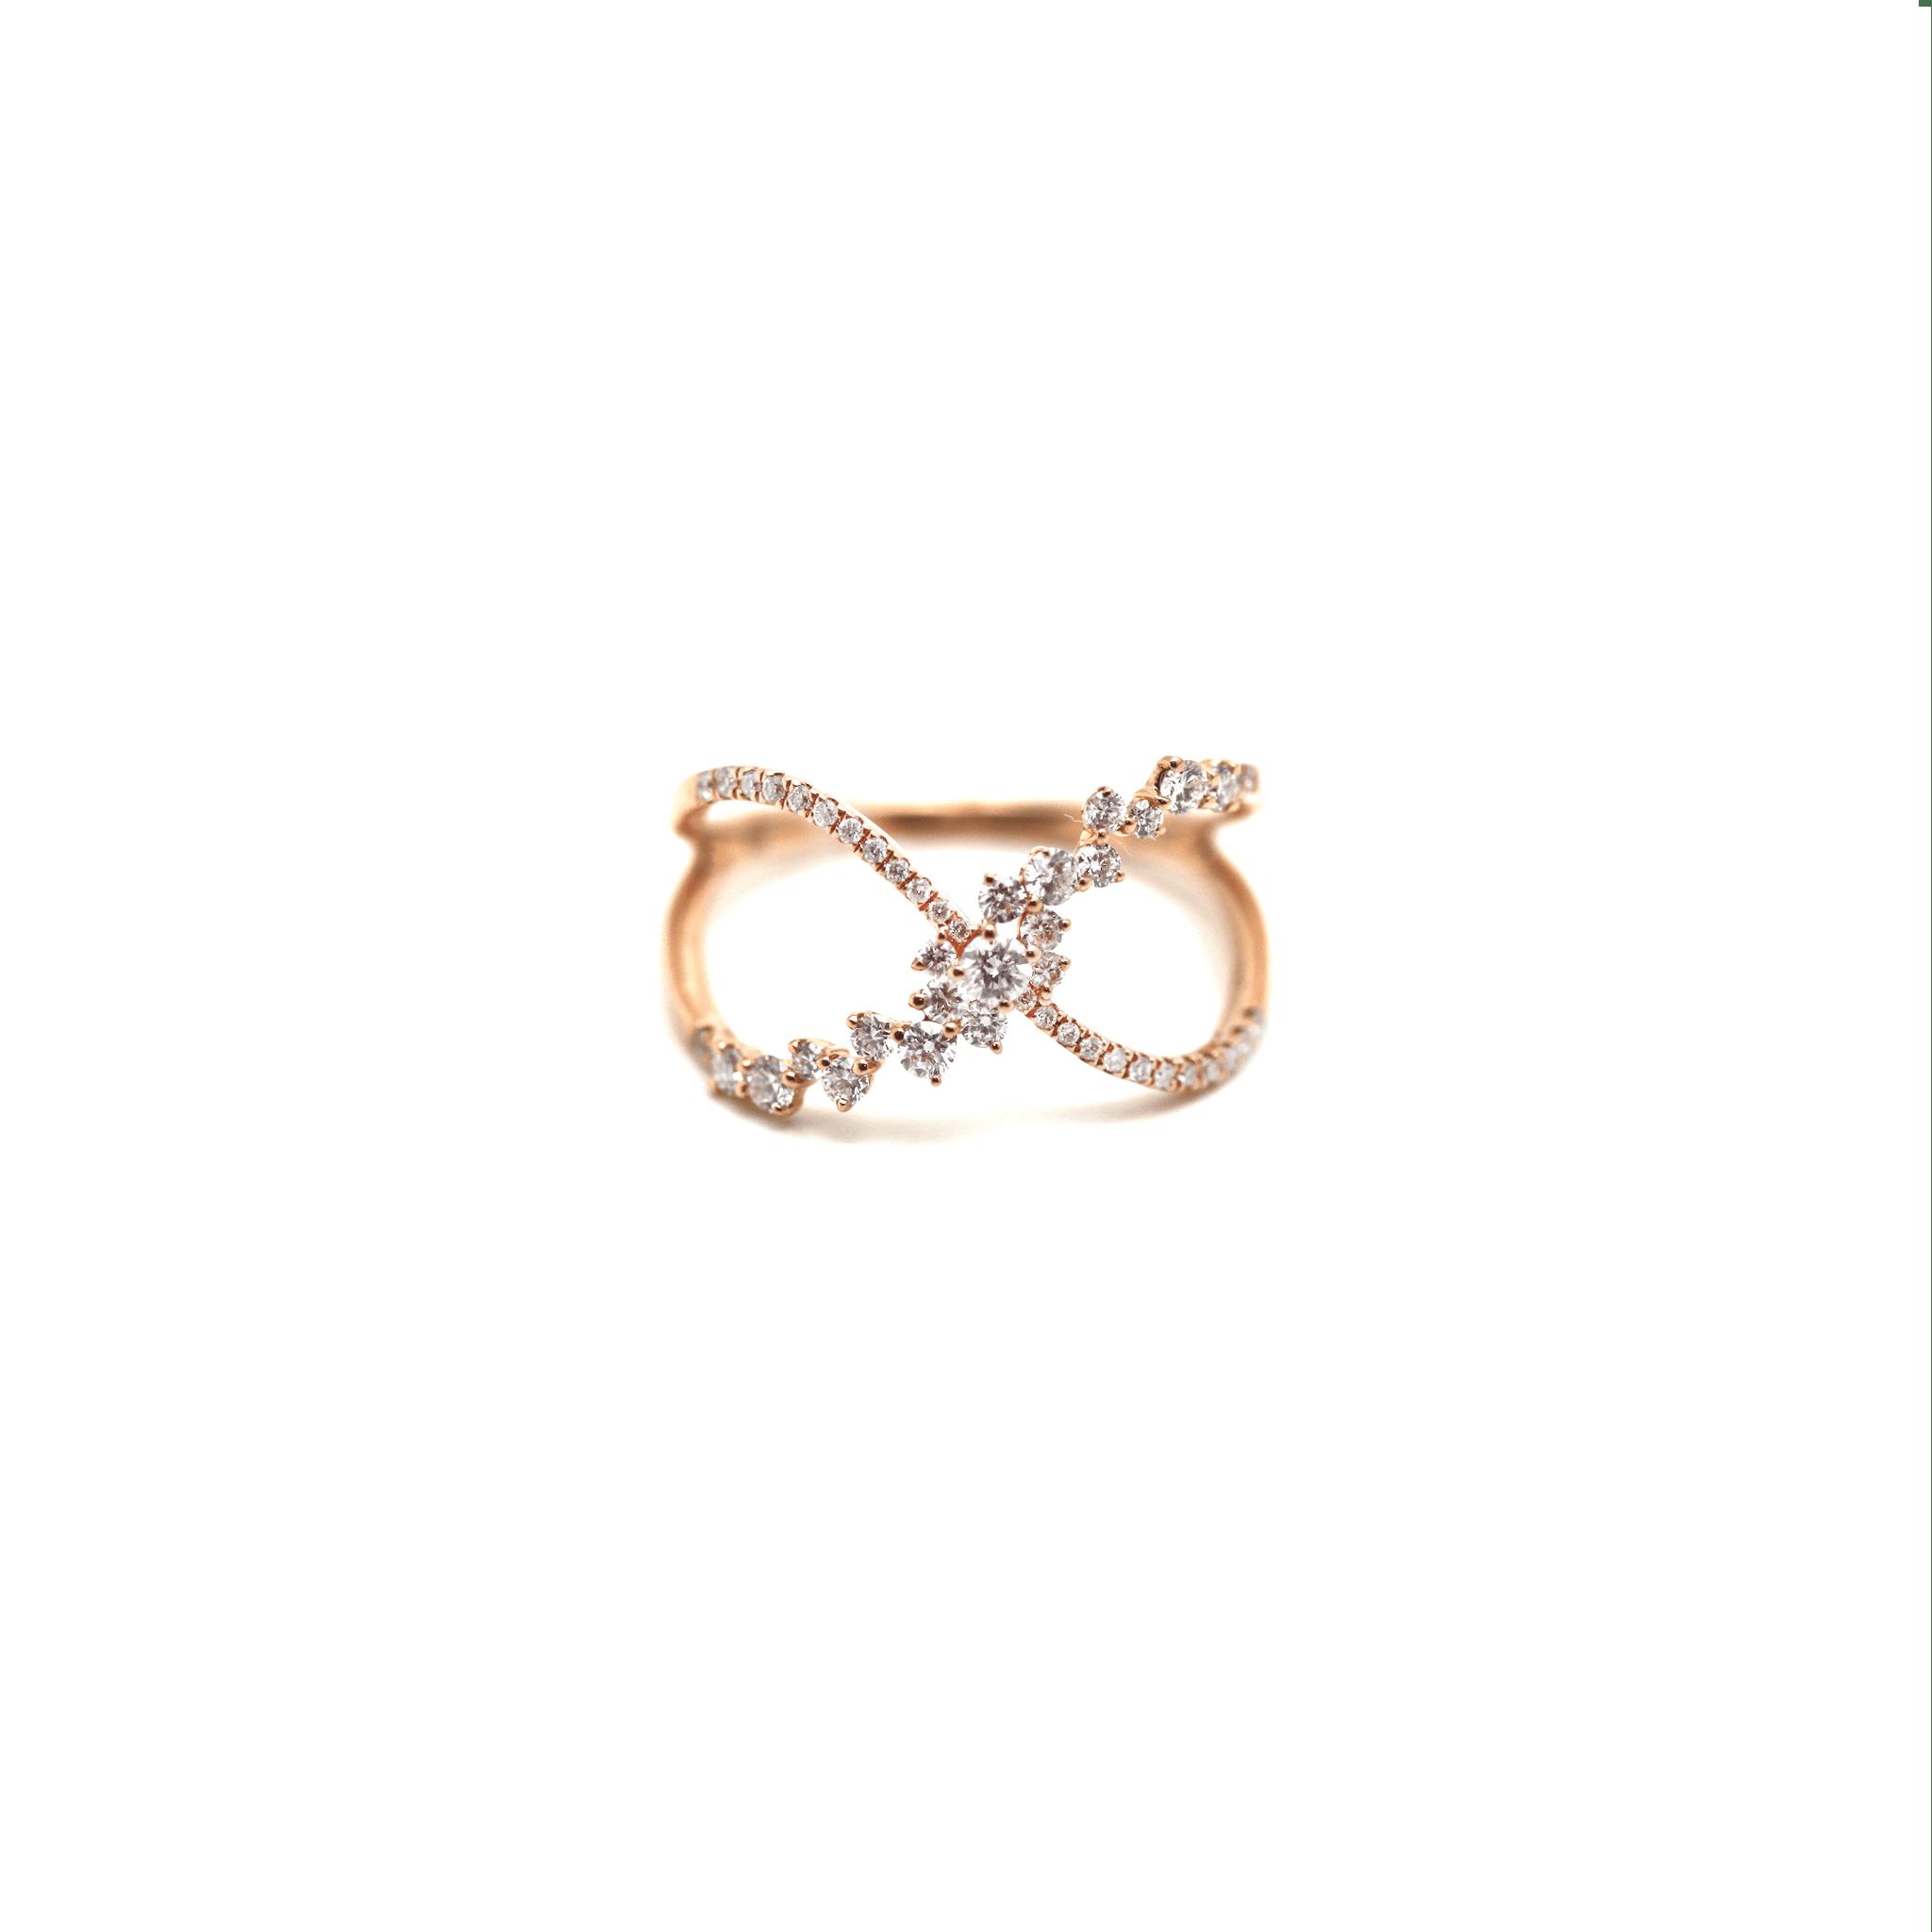 Tresor Collection - Criss Cross Diamond Ring in 18k RG